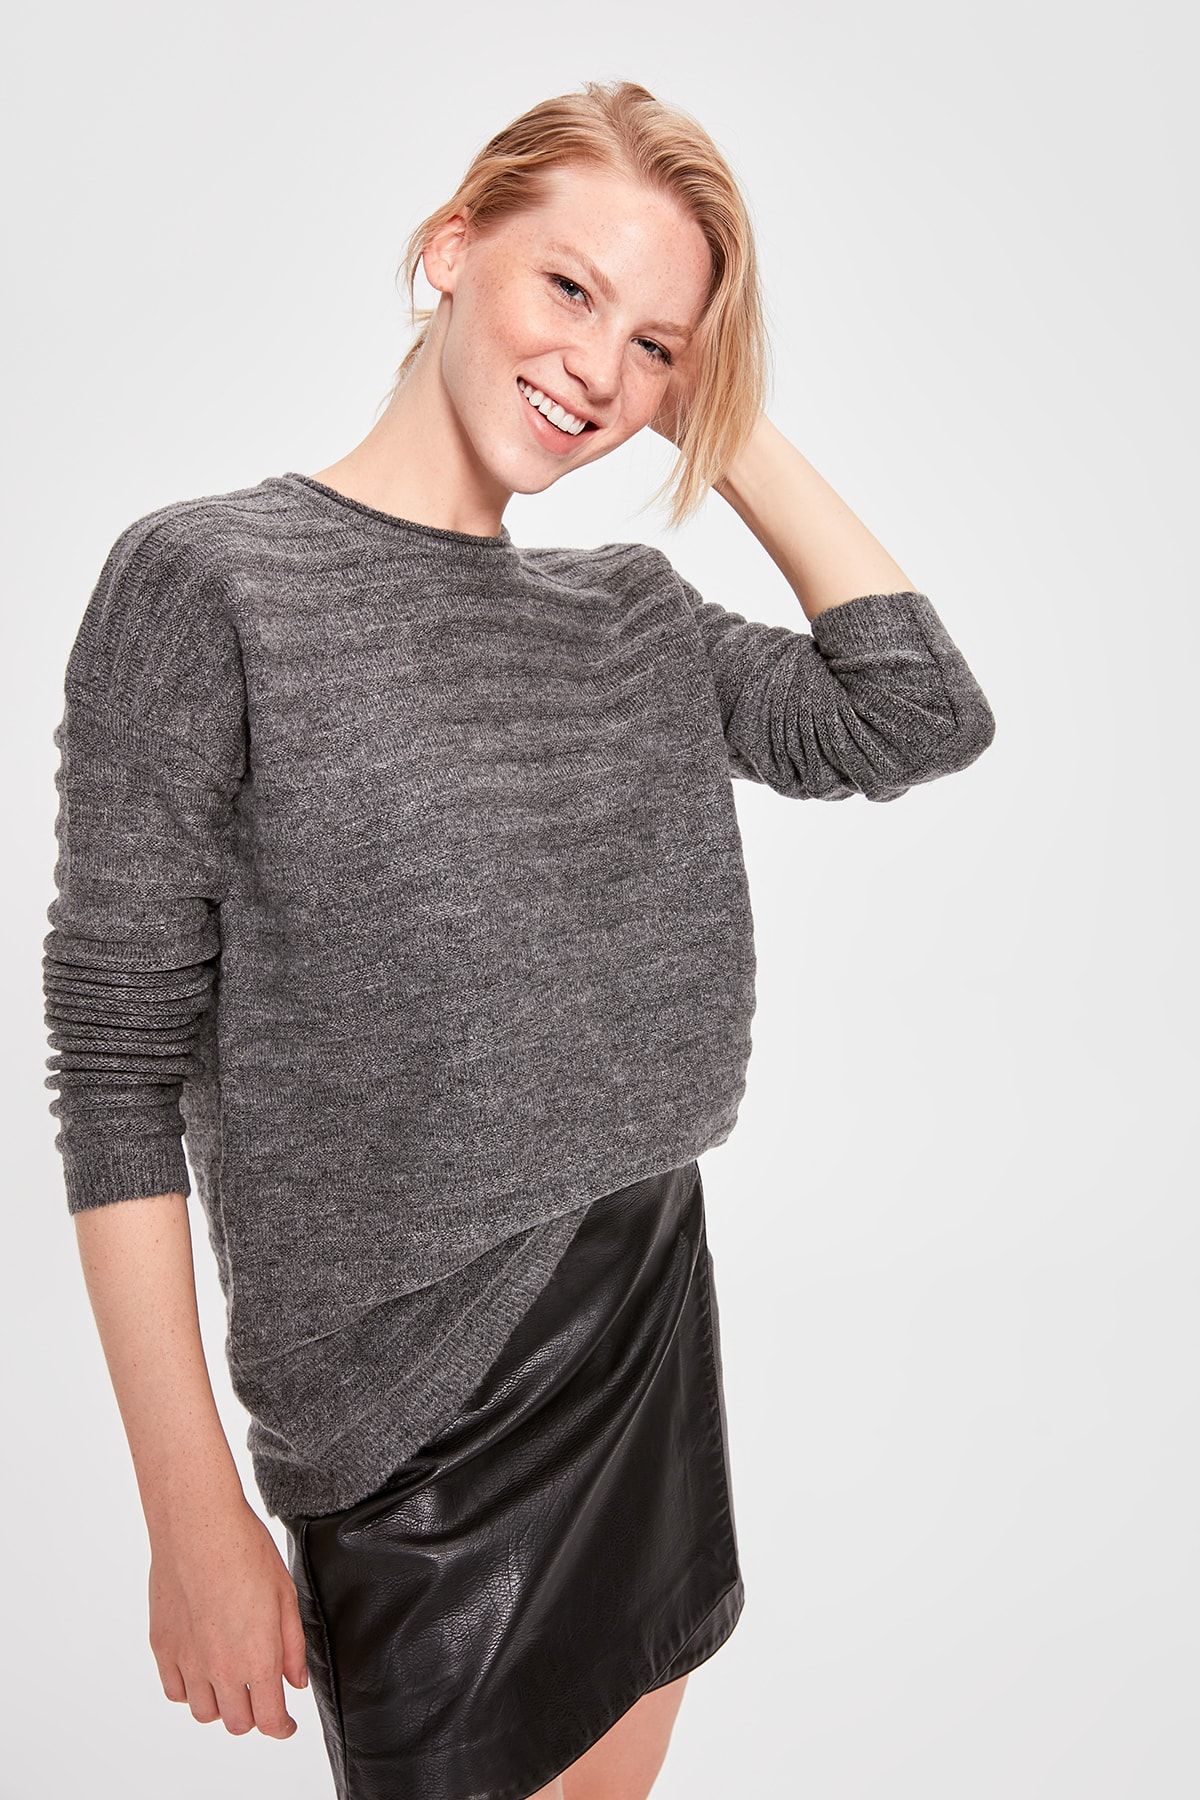 Trendyol Anthracite Bike Collar Braided Knitwear Sweater TWOAW20KZ0210